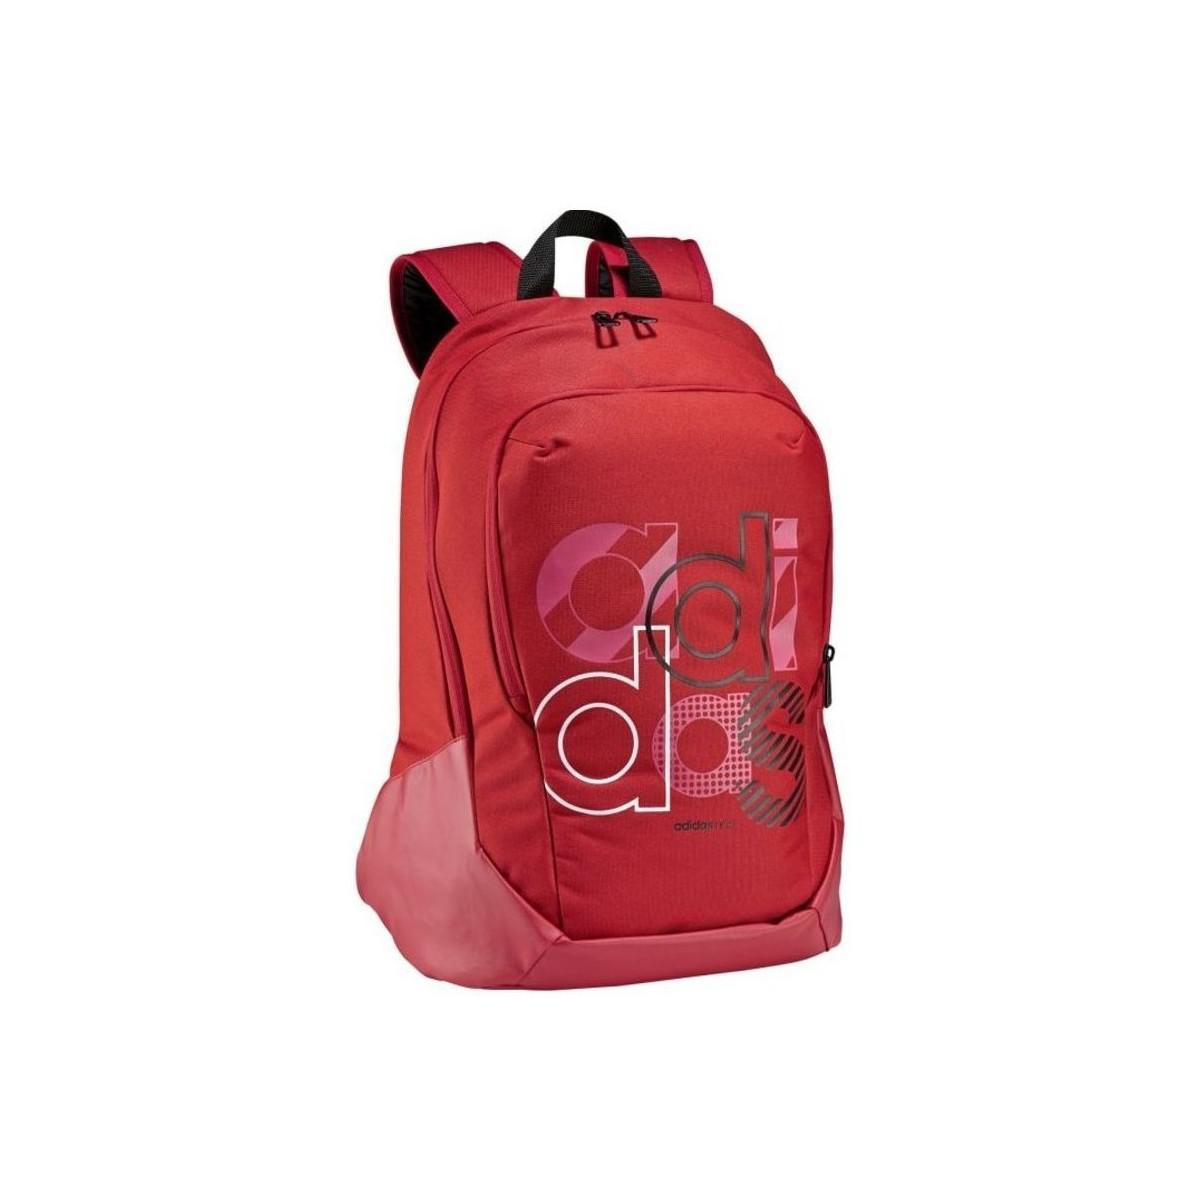 7ddad0cb056 Adidas Bp Neopark Men s Backpack In Red in Red for Men - Lyst